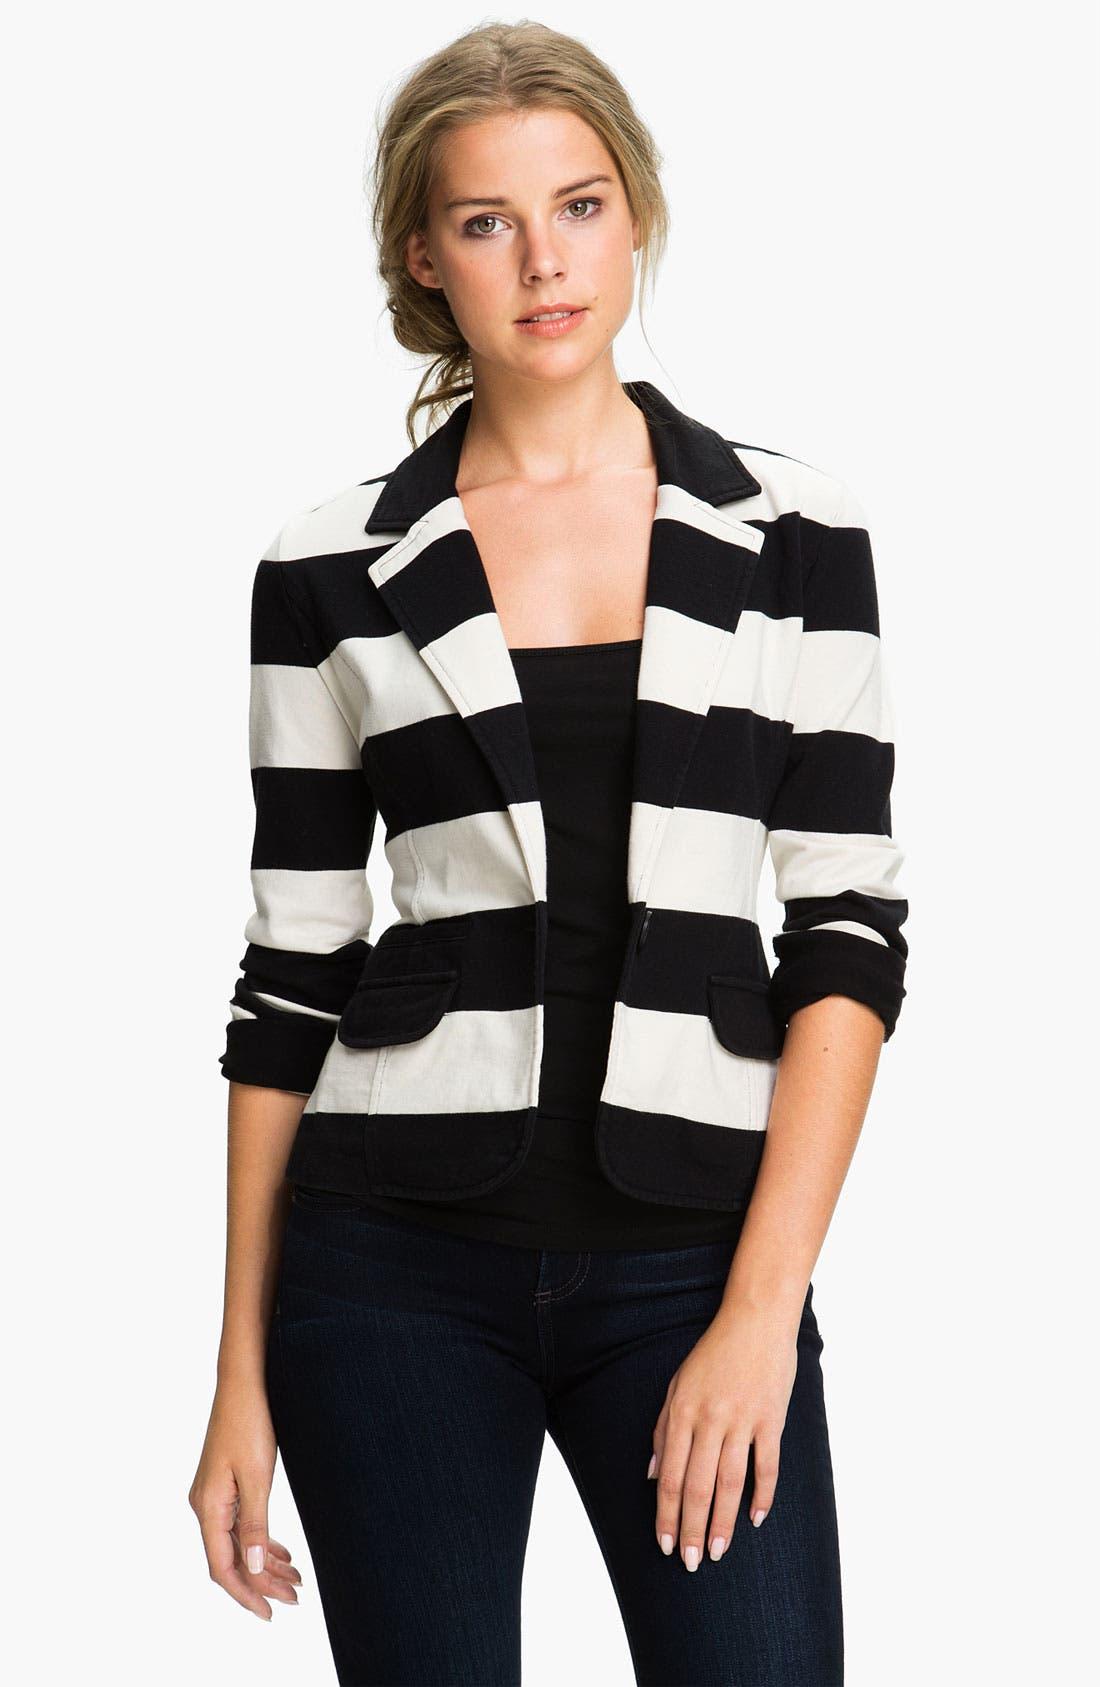 Alternate Image 1 Selected - Caslon® Blazer, Vince Camuto Pants & Halogen® Top